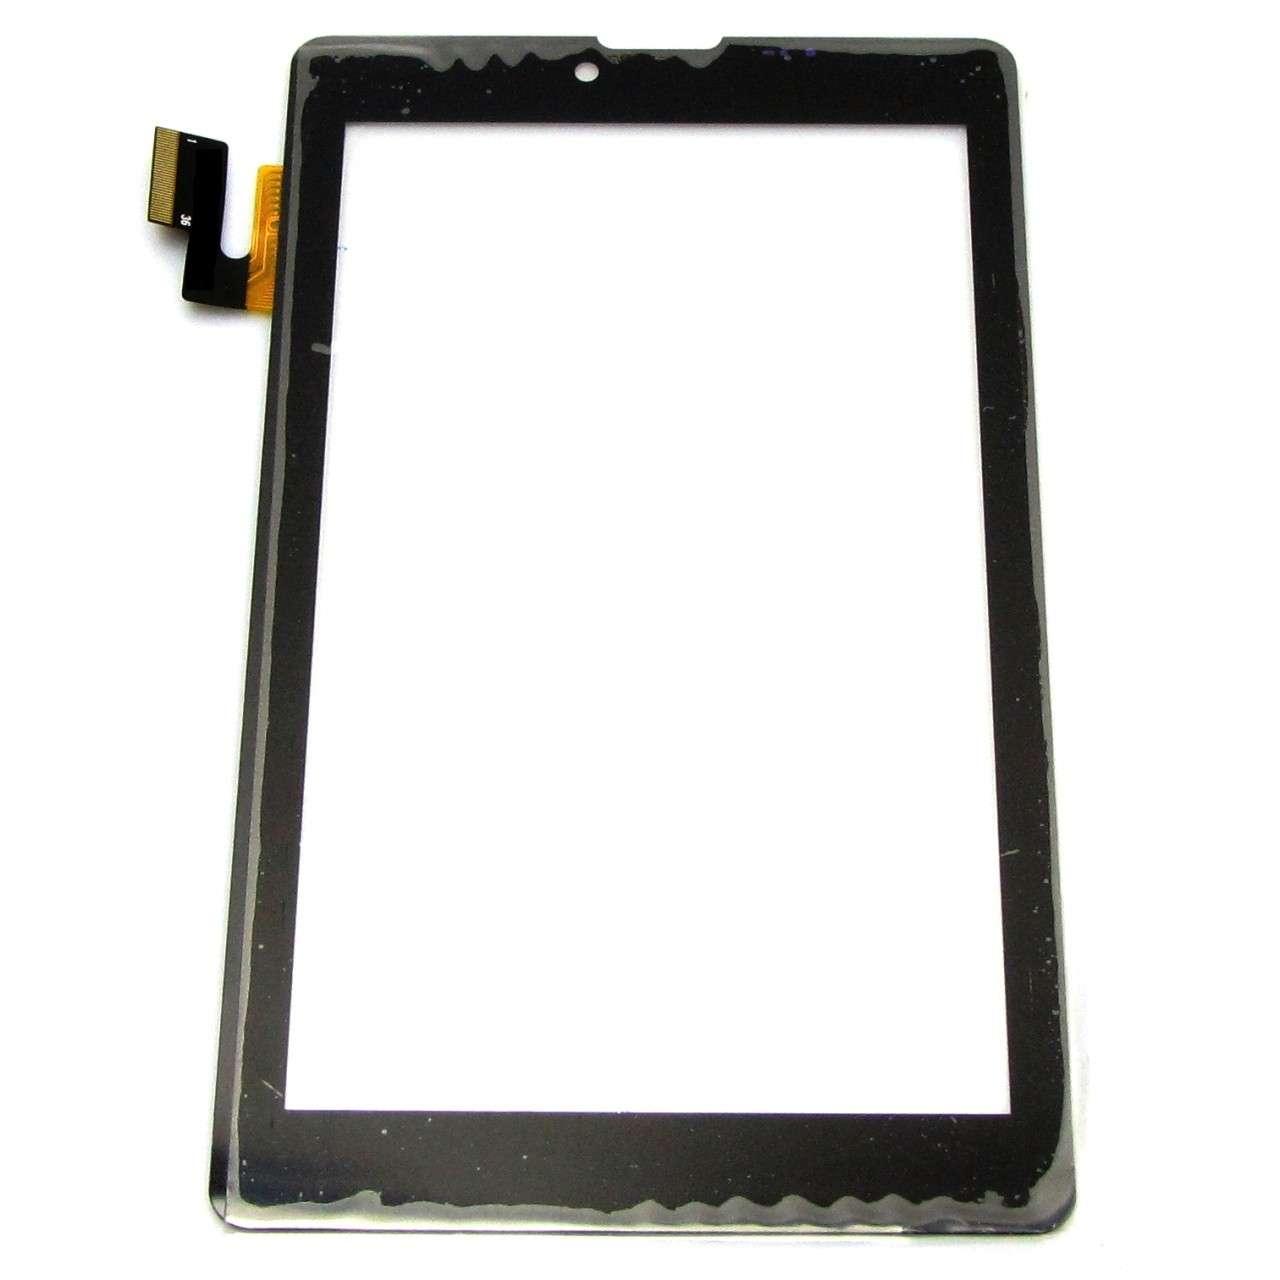 Touchscreen Digitizer GoClever Quantum 700M Geam Sticla Tableta imagine powerlaptop.ro 2021